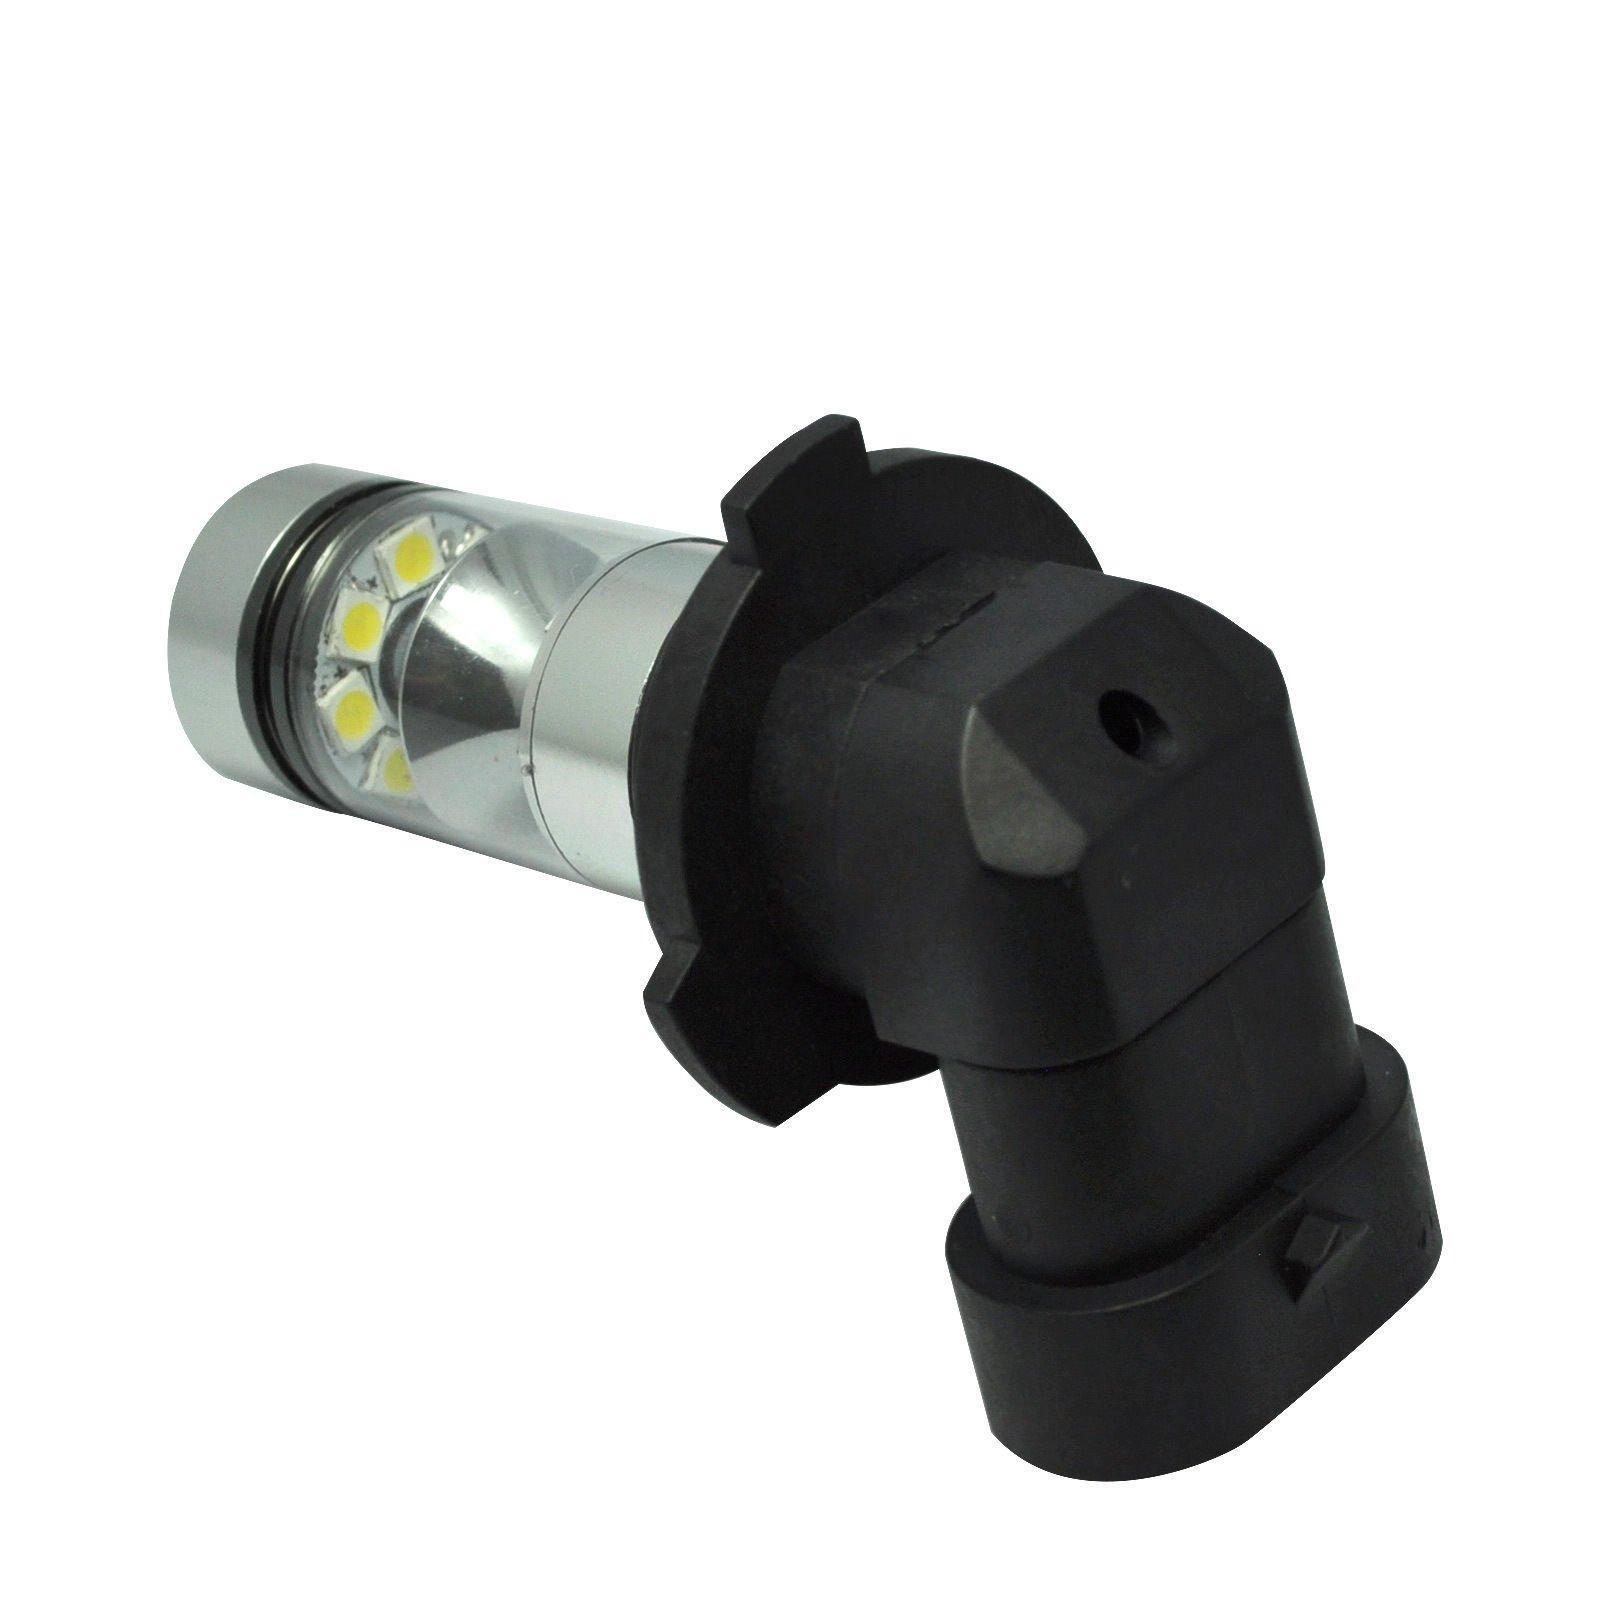 2 x 100W H10 9145 High Power CREE LED 6000K Super White Fog Light Lamp Bulbs by Carb Omar (Image #4)